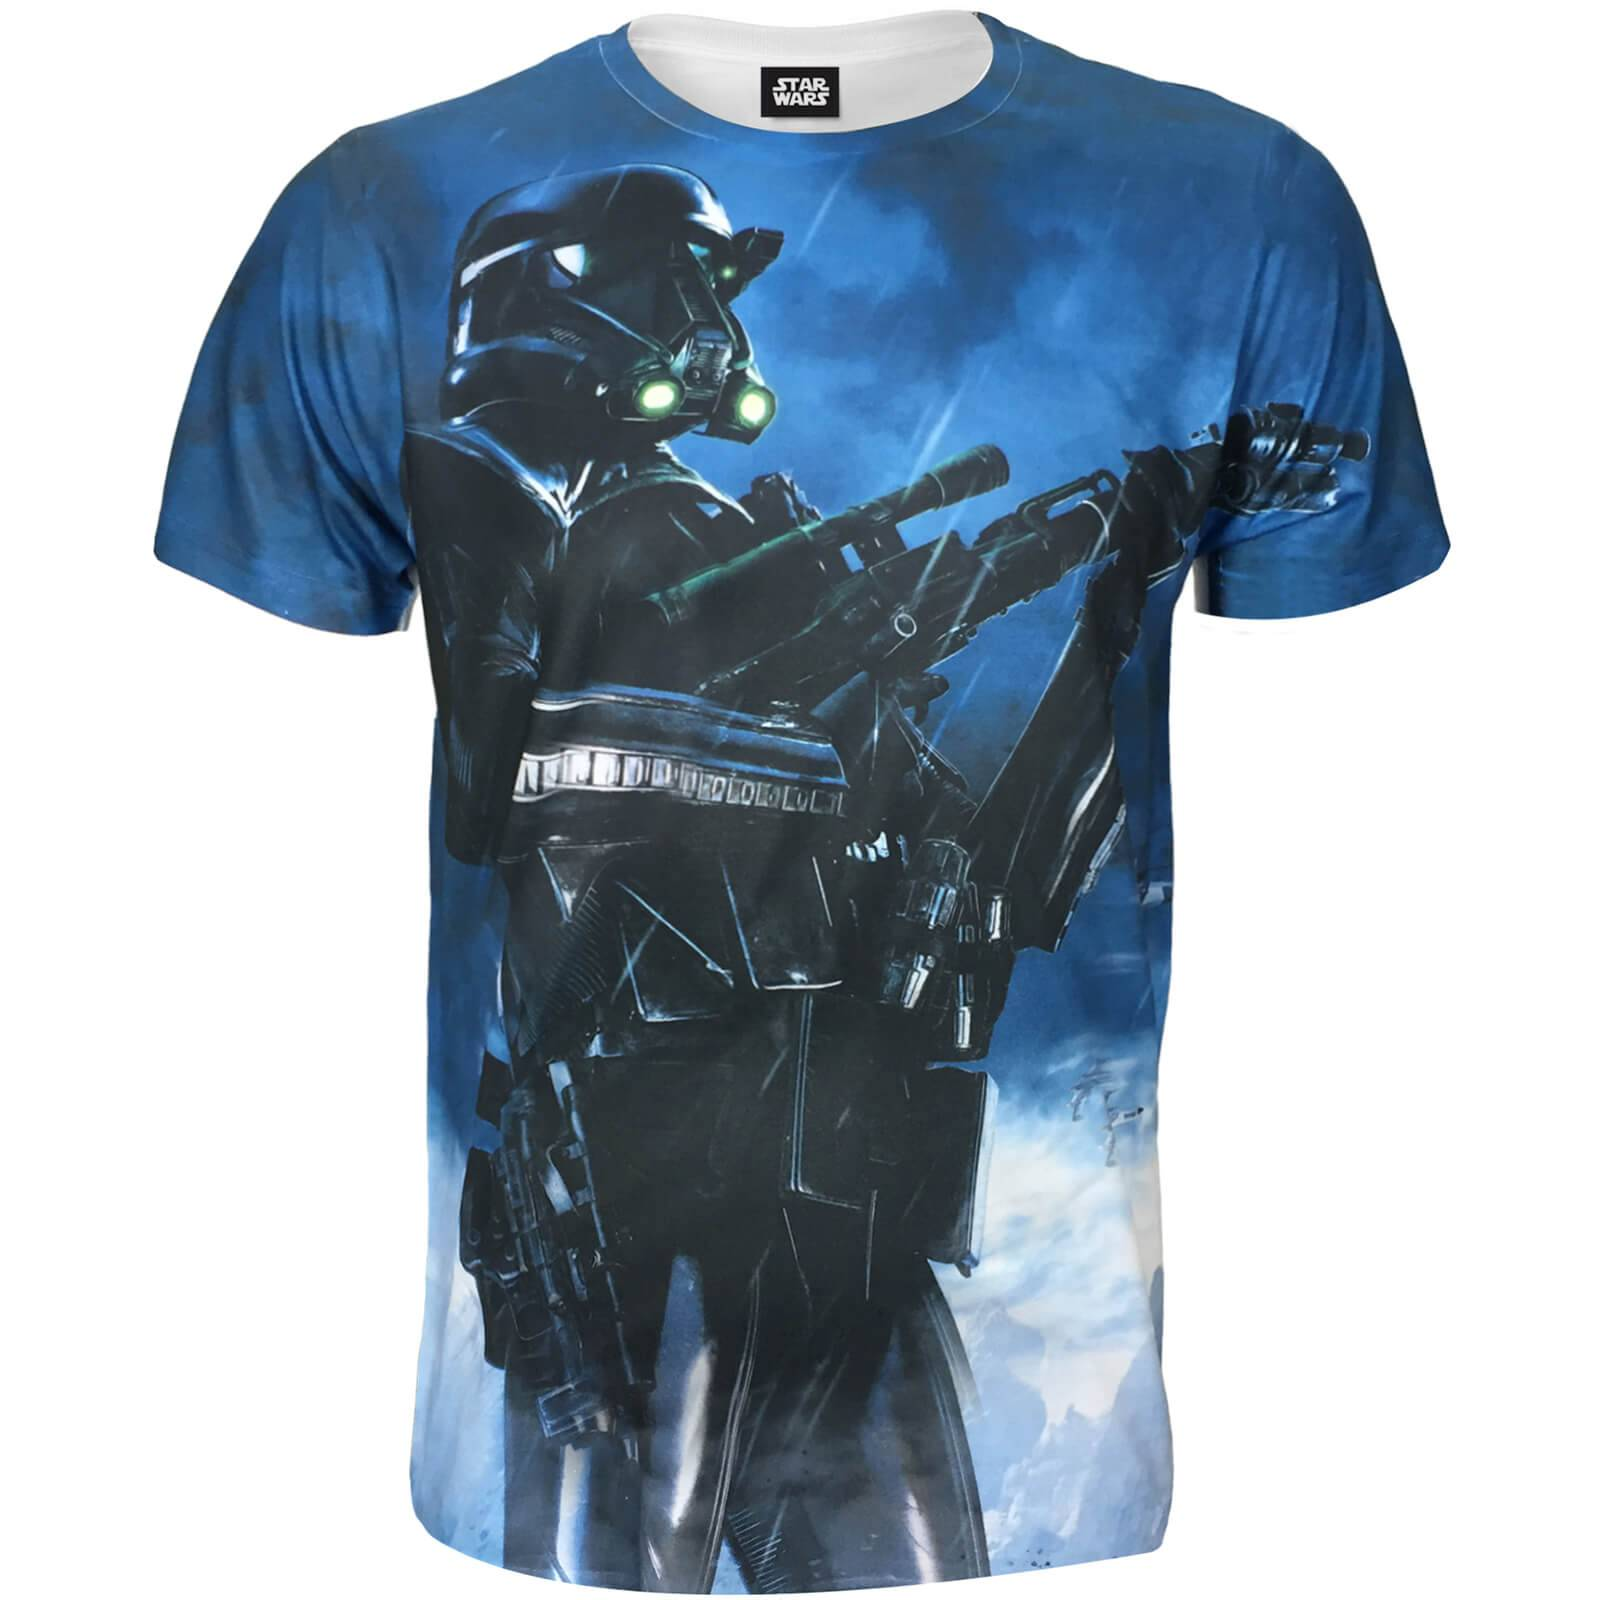 Geek Clothing Star Wars Rogue One Men's Battle Stance Death Trooper T-Shirt - Blue - L - Blue